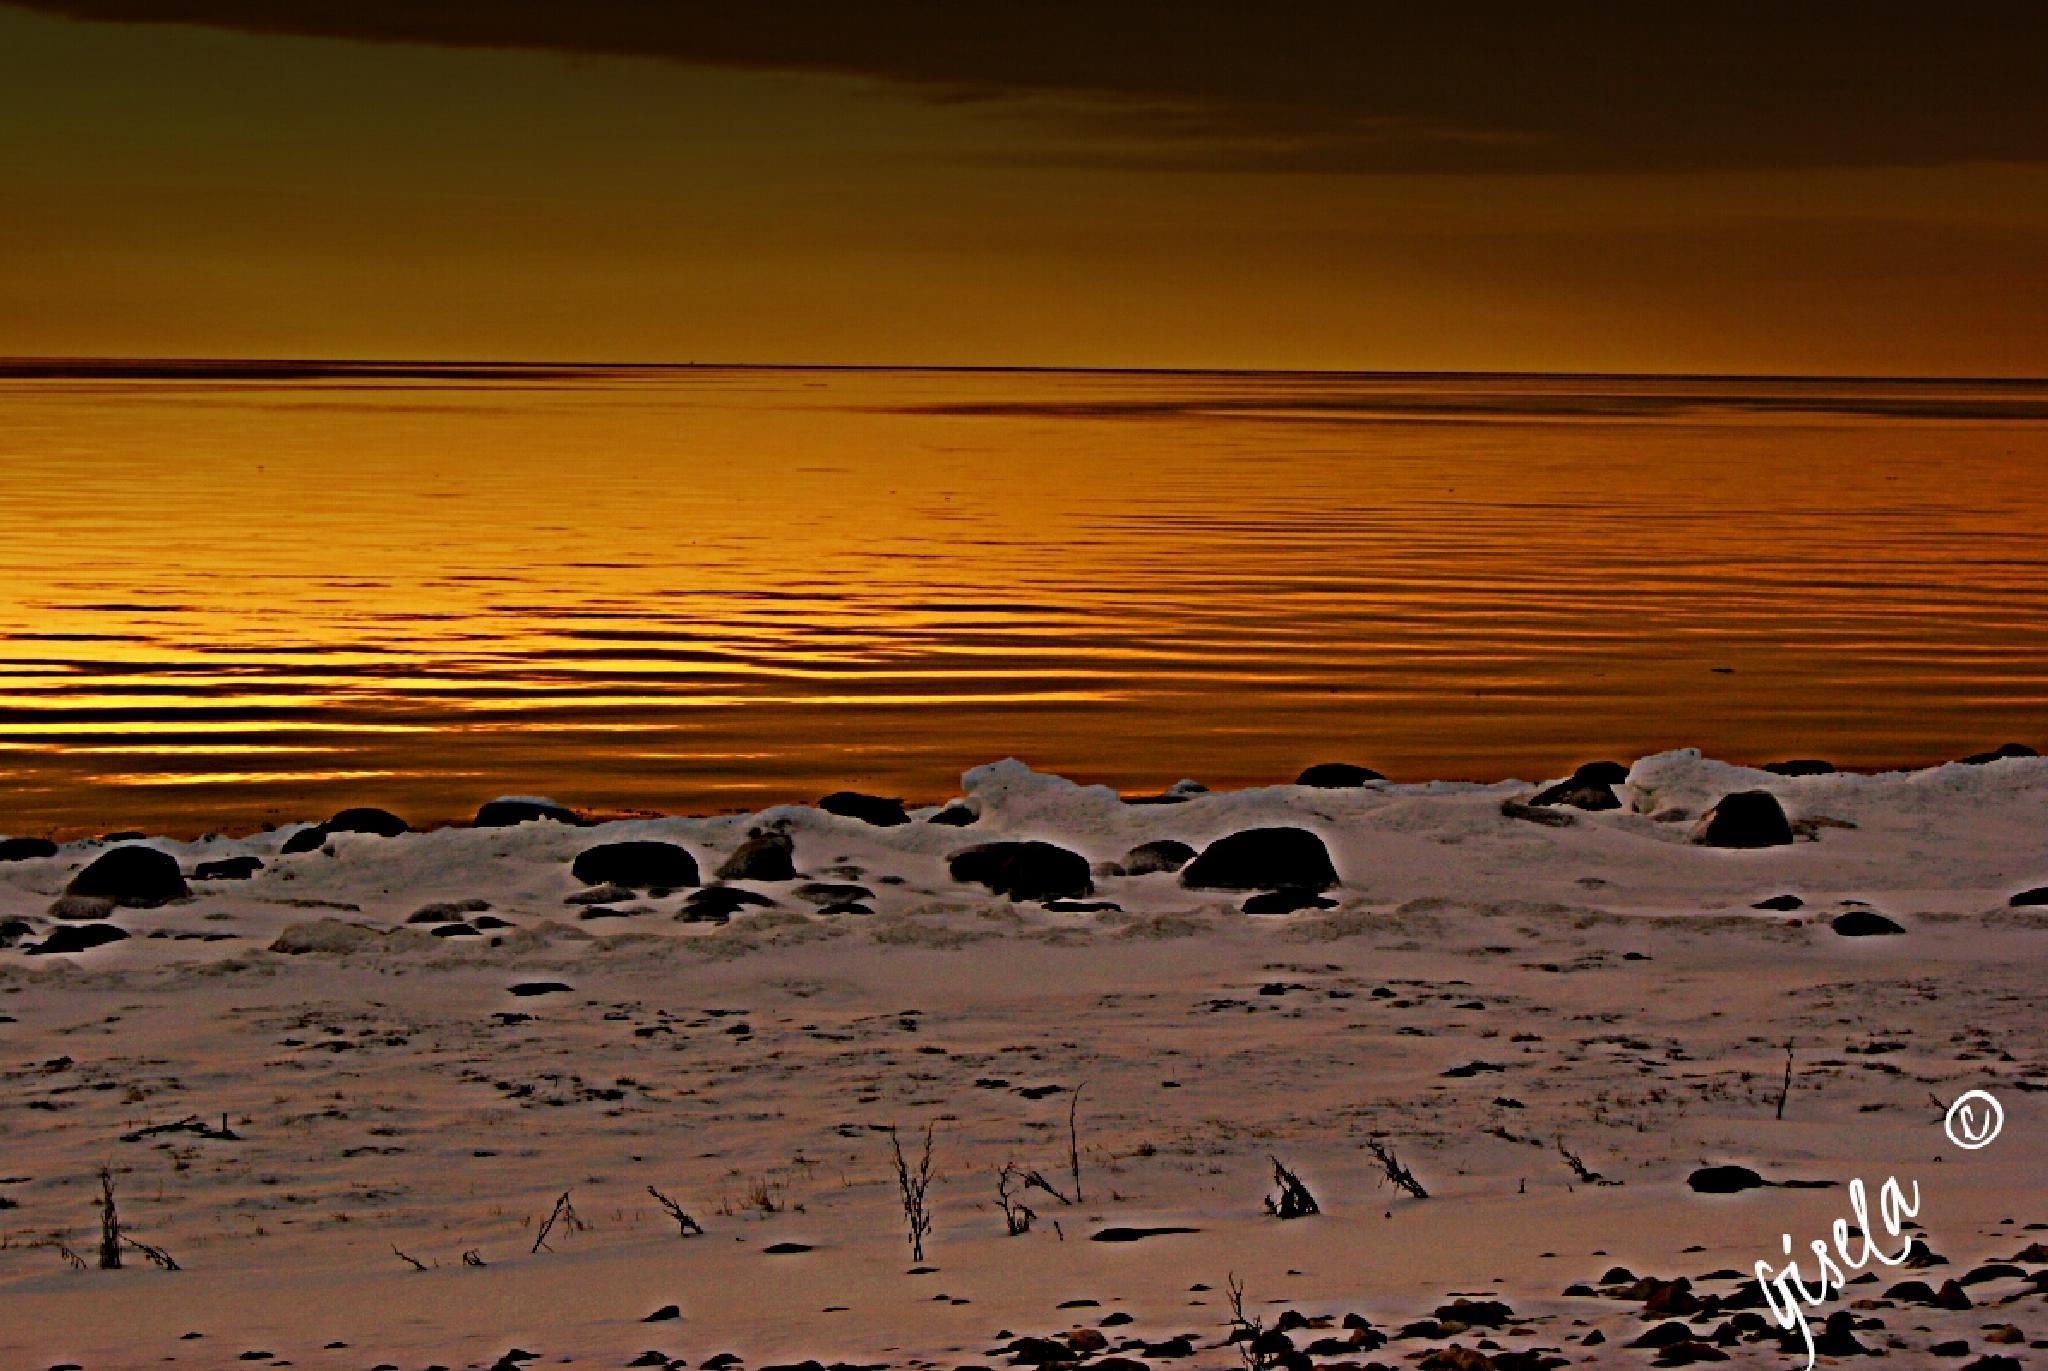 Öresund between Sweden and Denmark in a wintersday  by Gisela Tenggren